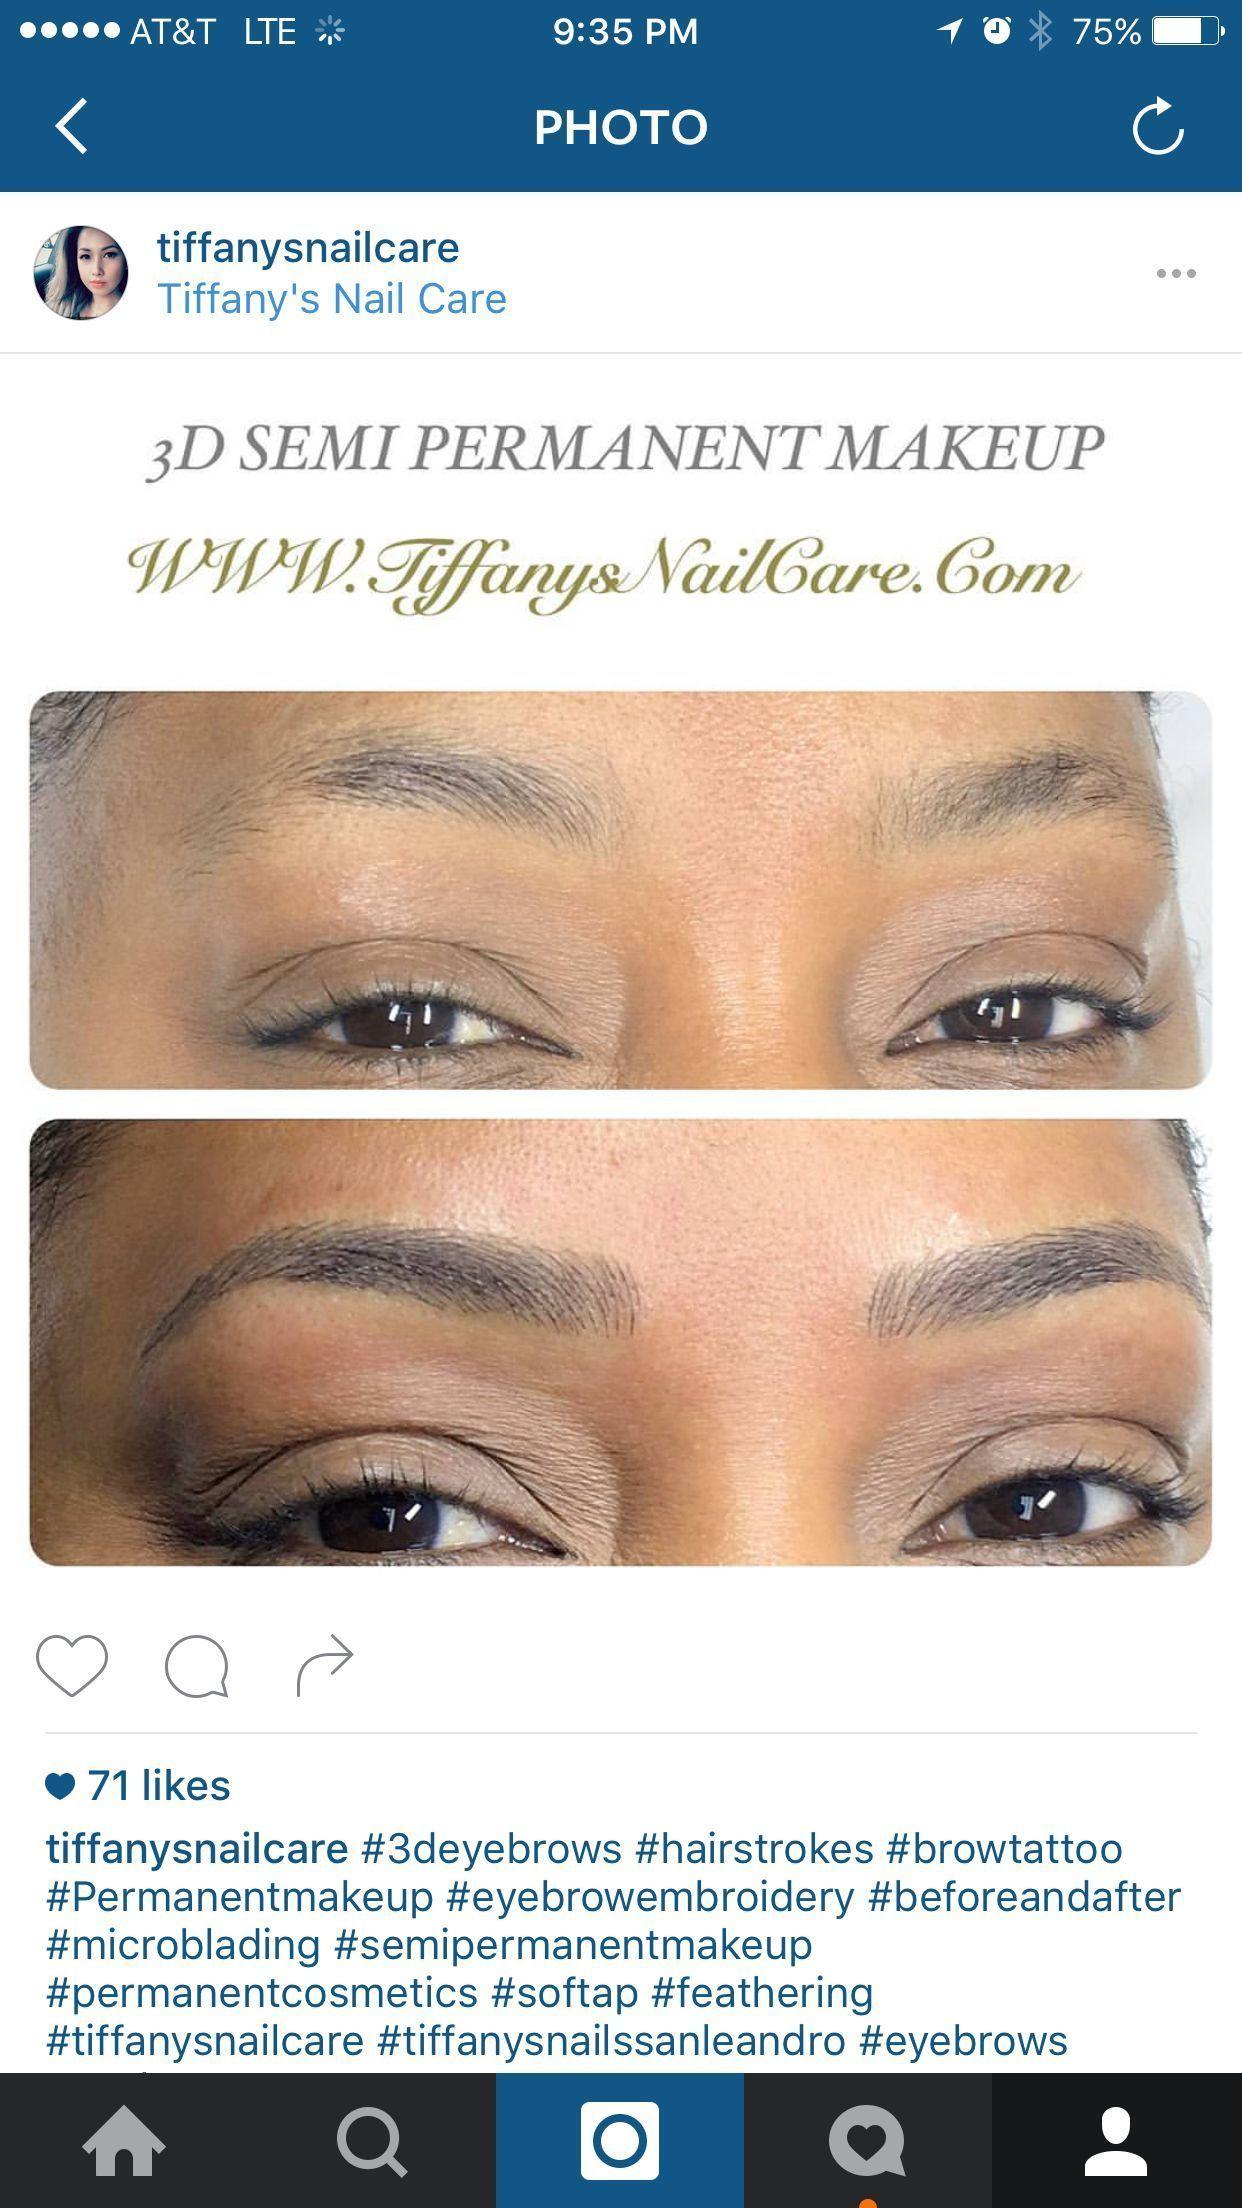 3d Hair Stroke Permanent Makeup Eyebrows : stroke, permanent, makeup, eyebrows, Hairline, Semi-permanent, Makeup, Tattoo., Cosmetic, Feathers., Microblading, #half, Permanent, Tatt…, Augenbrauen,, Augen,